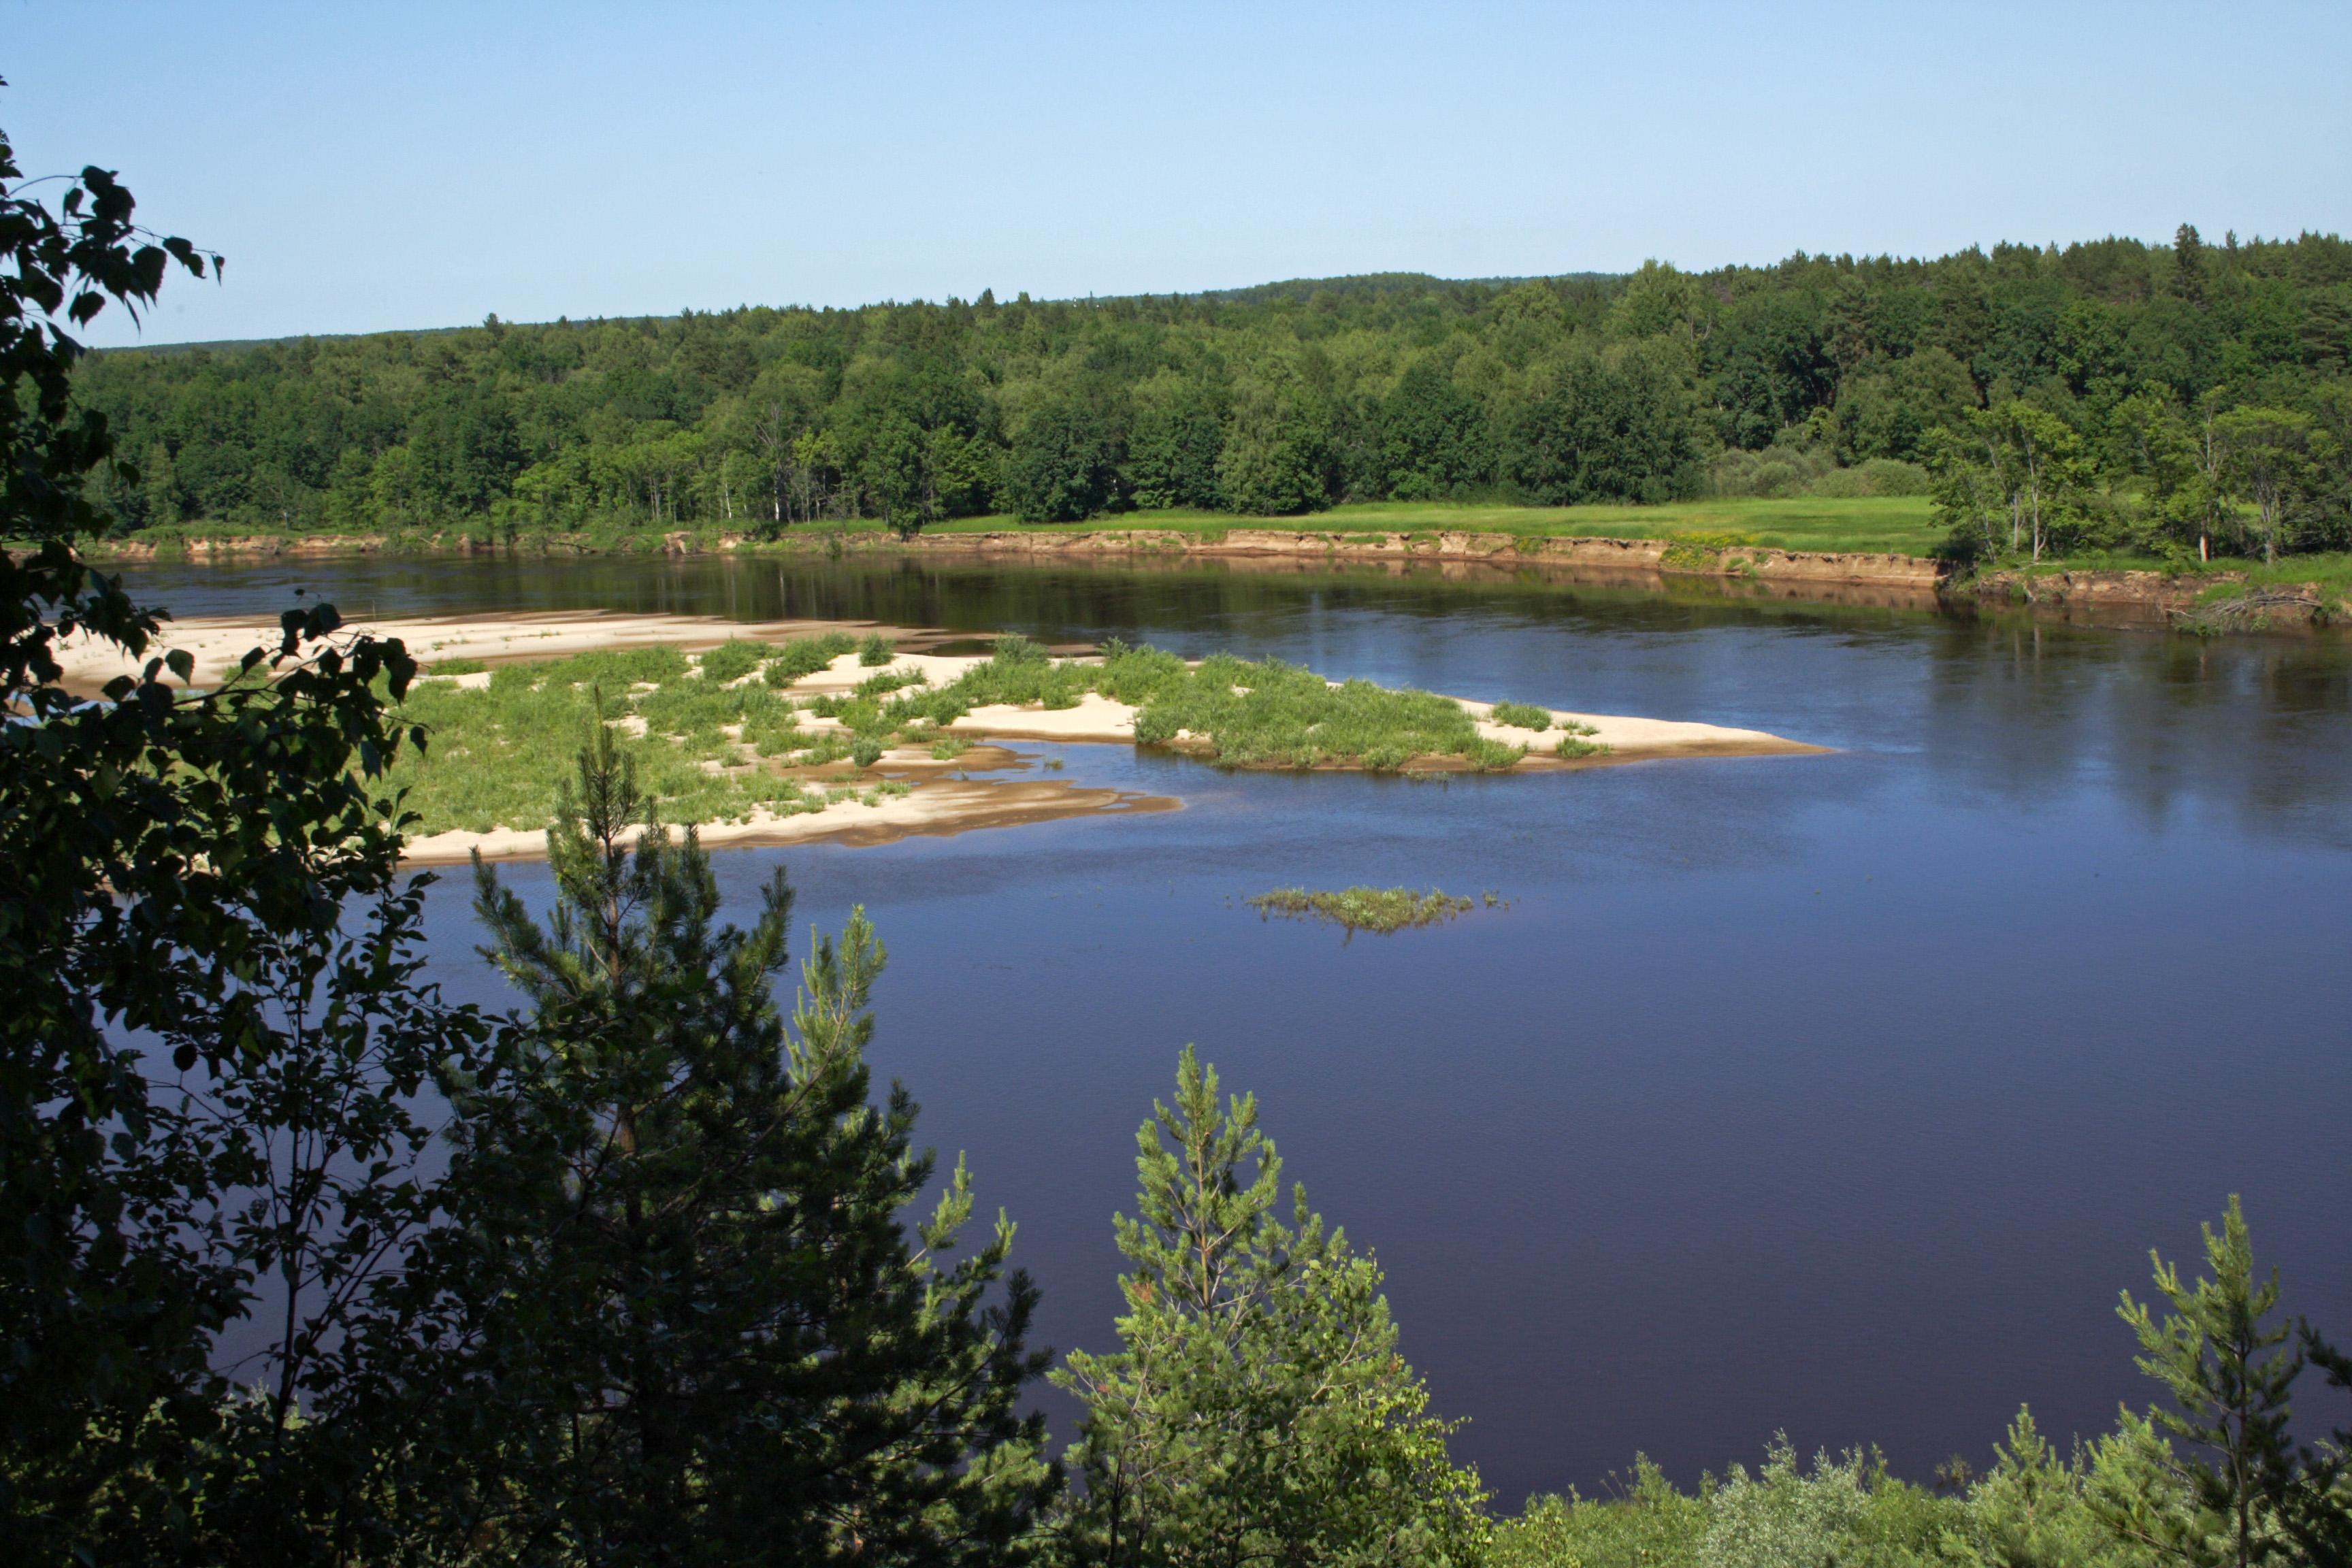 Деревня пянда фото с реки